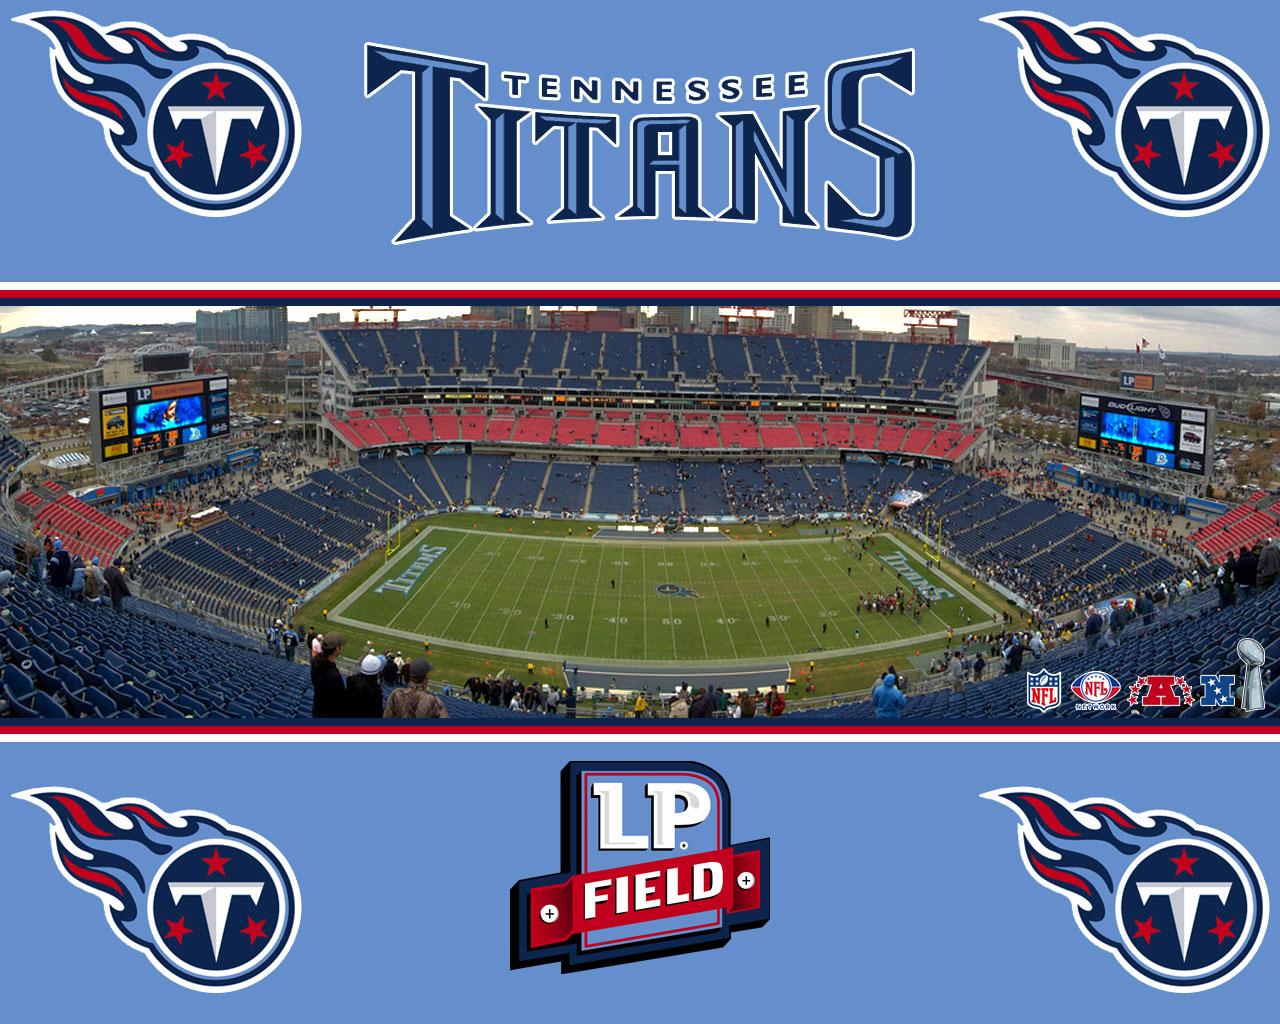 Lp Field Stadium Tennessee Titans Wallpaper